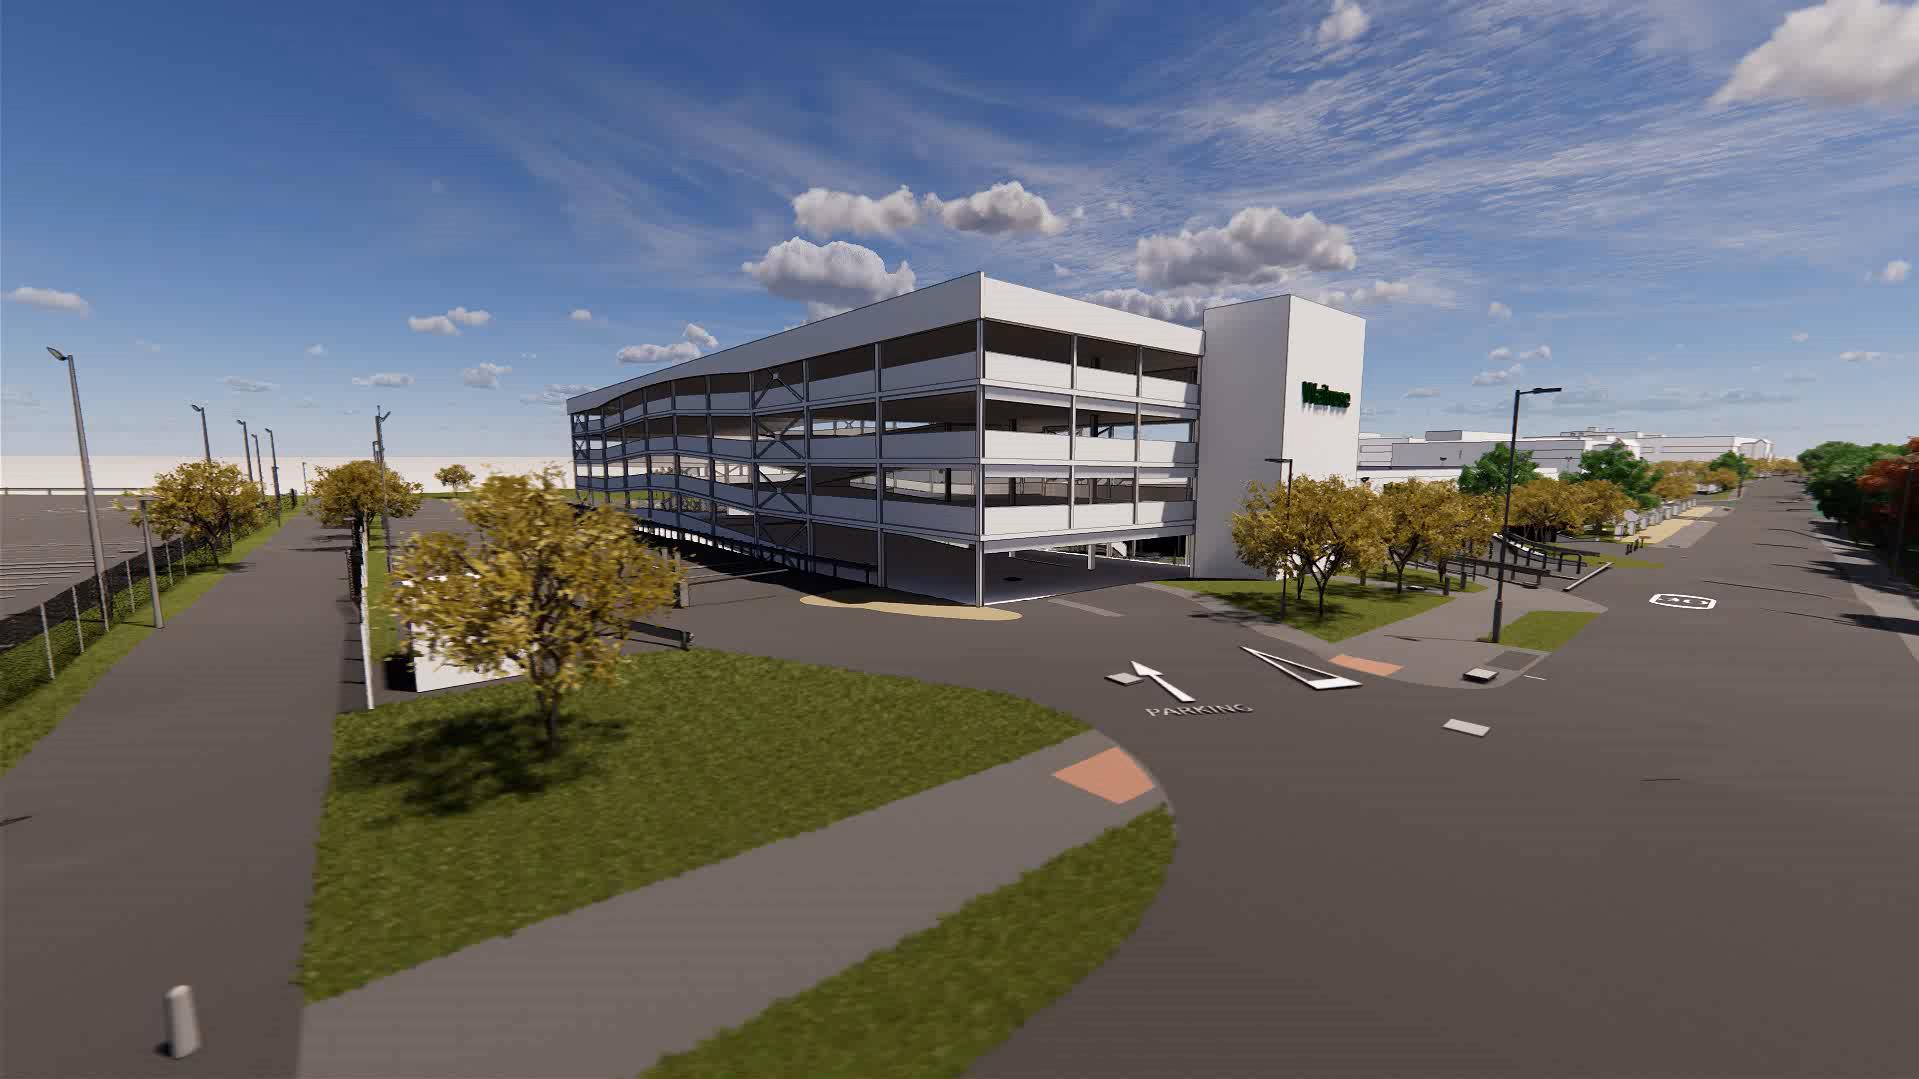 Waitrose Campus Bracknell multi-floor car park